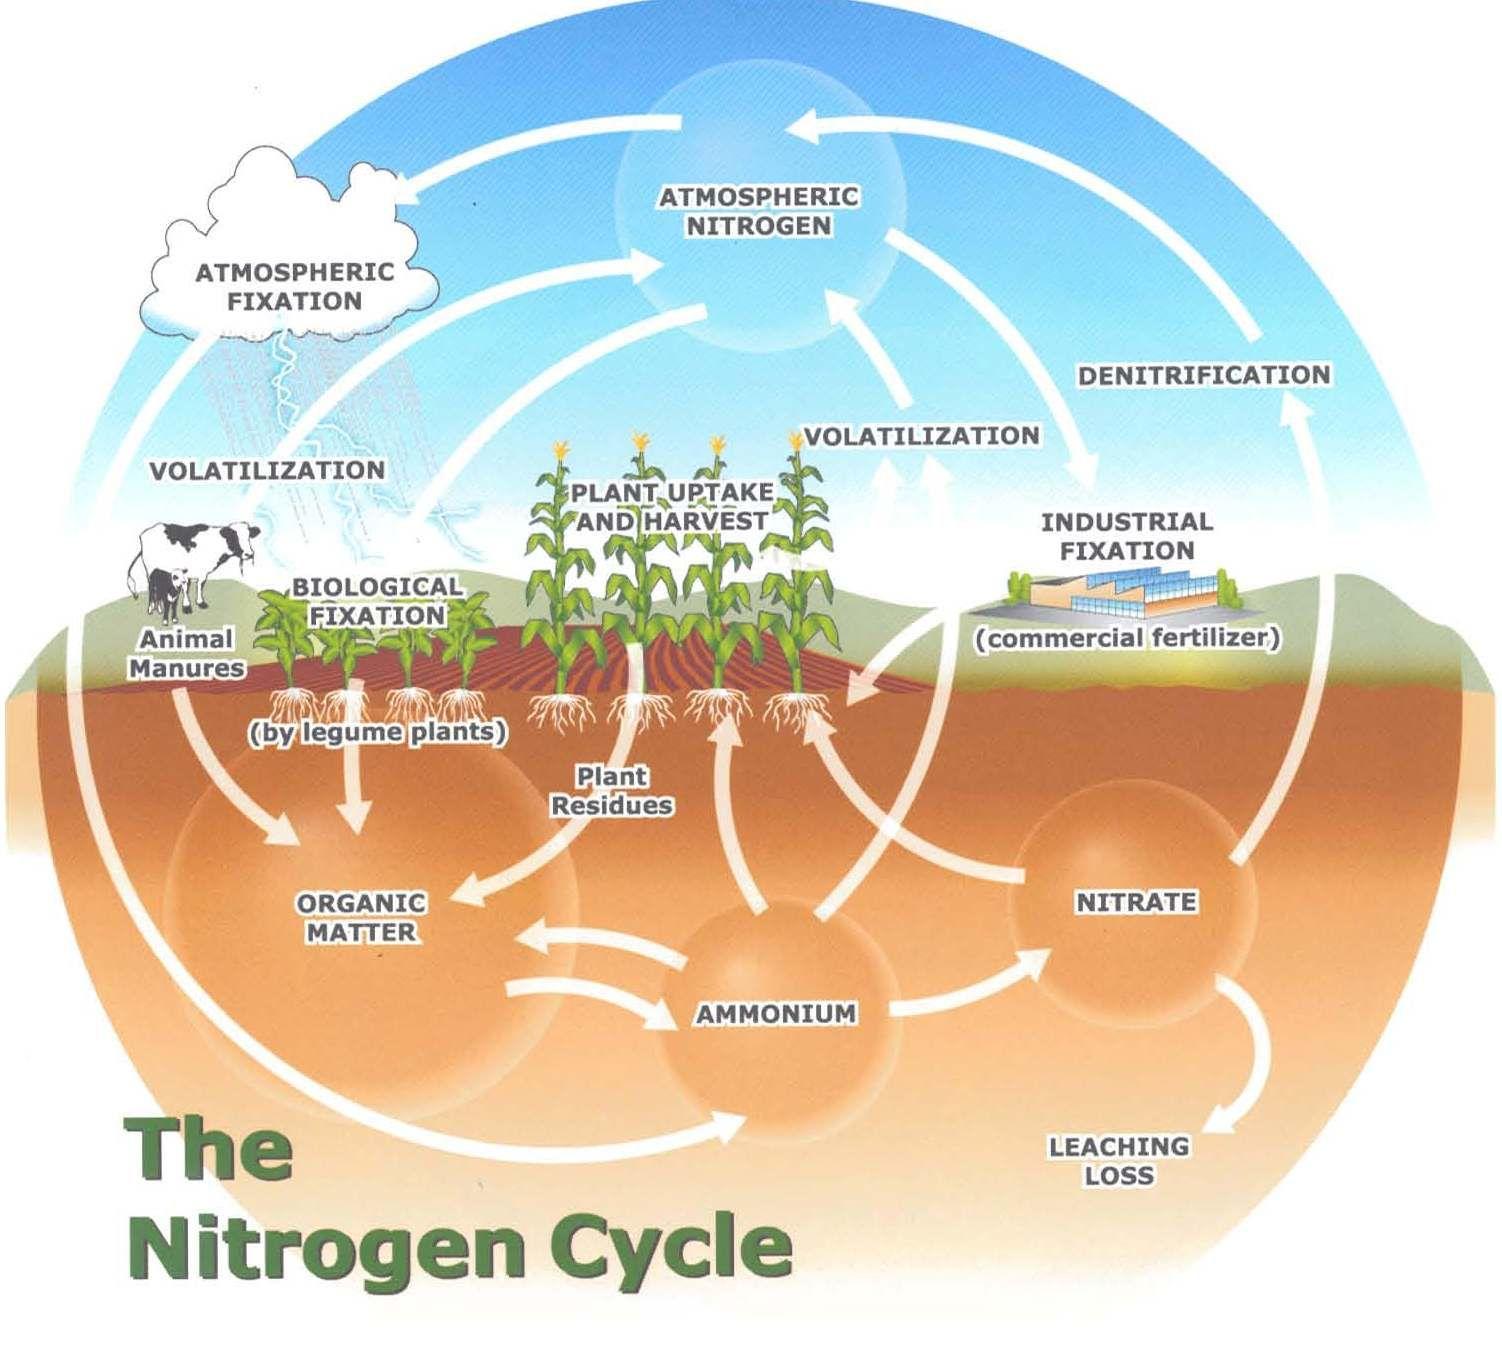 nitrogen cycle sources of atmospheric nitrogen decay of animal plant matter sinks for atmospheric nitrogen bacteria in soil plankton [ 1502 x 1363 Pixel ]